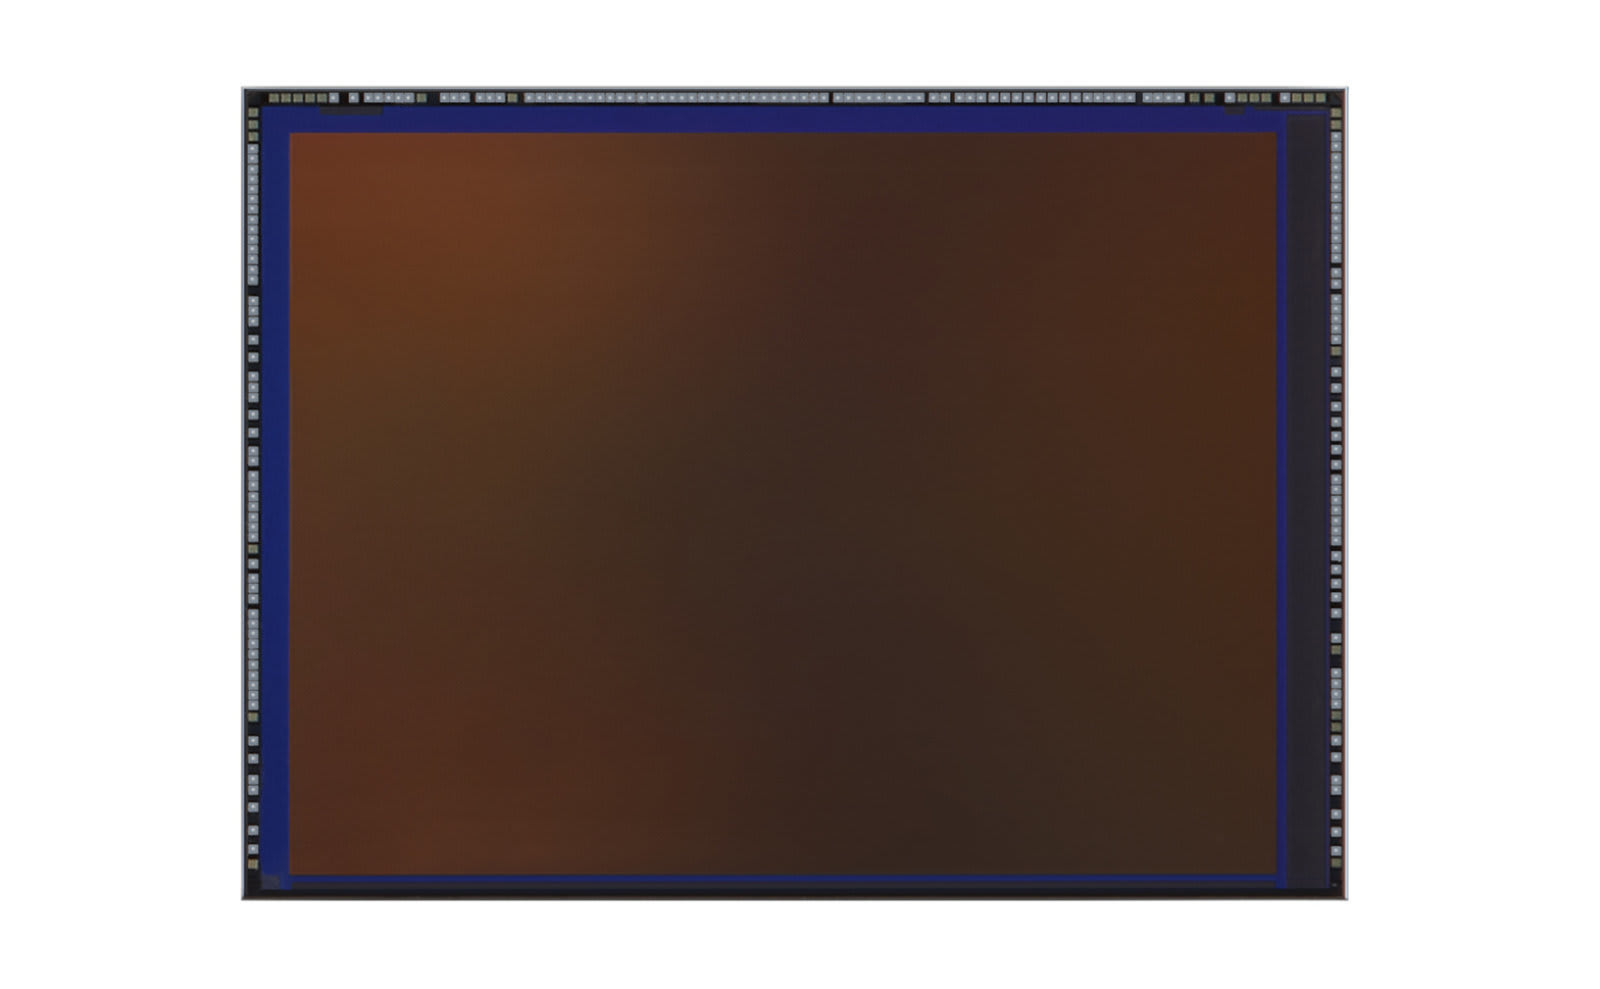 Samsung 108MP Mobile Sensor